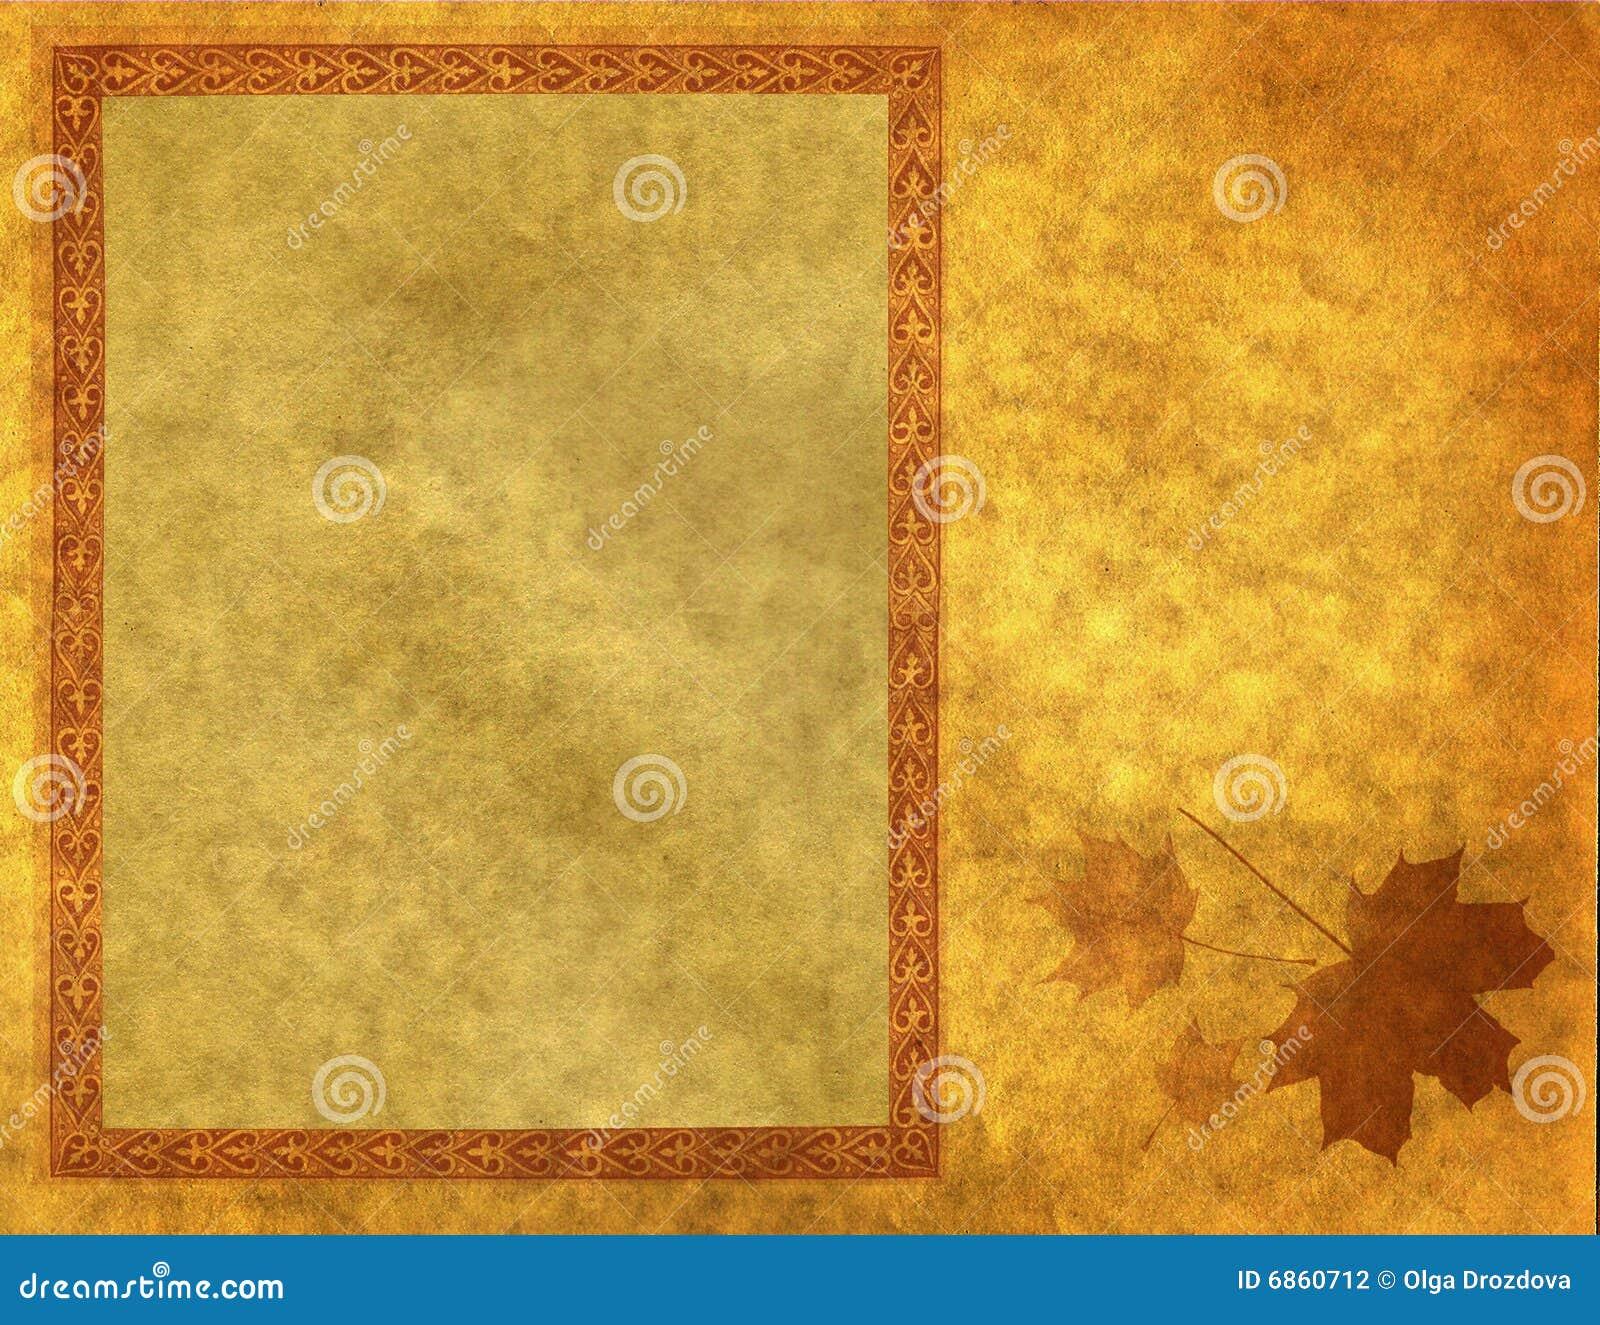 Blank frame on gold paper